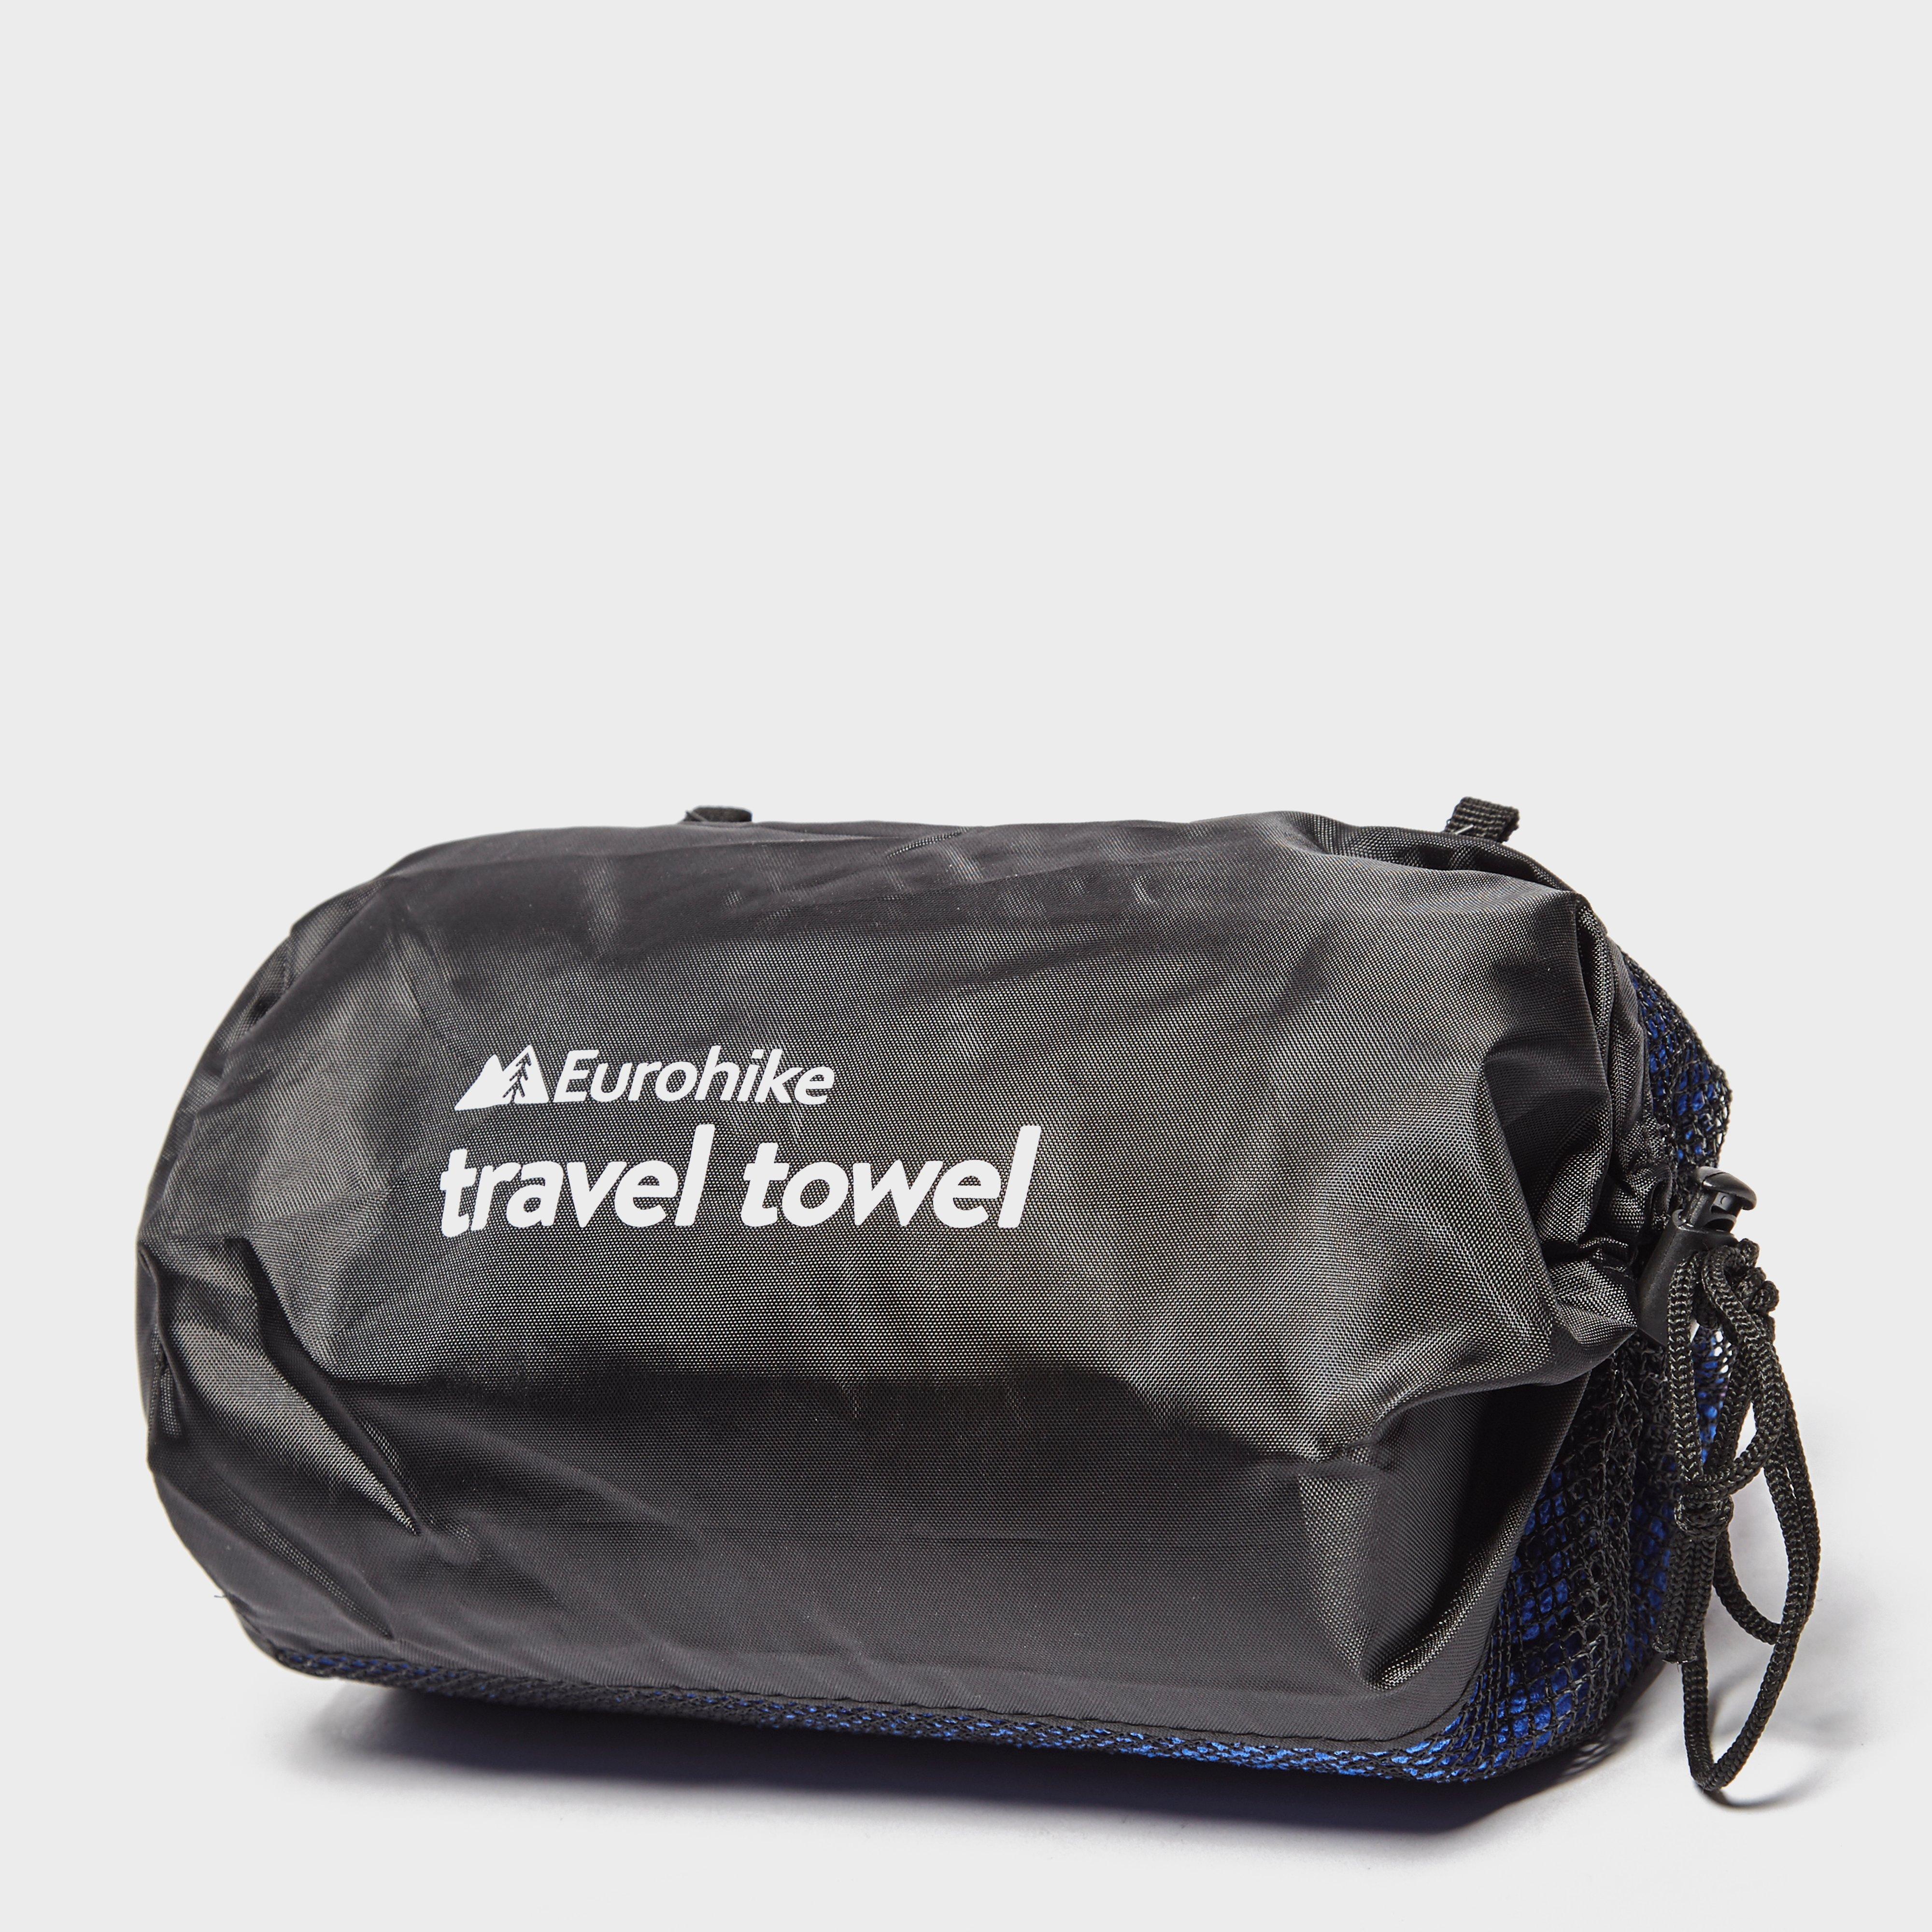 Where To Buy Travel Towel In Singapore: Eurohike Terry Microfibre Travel Towel